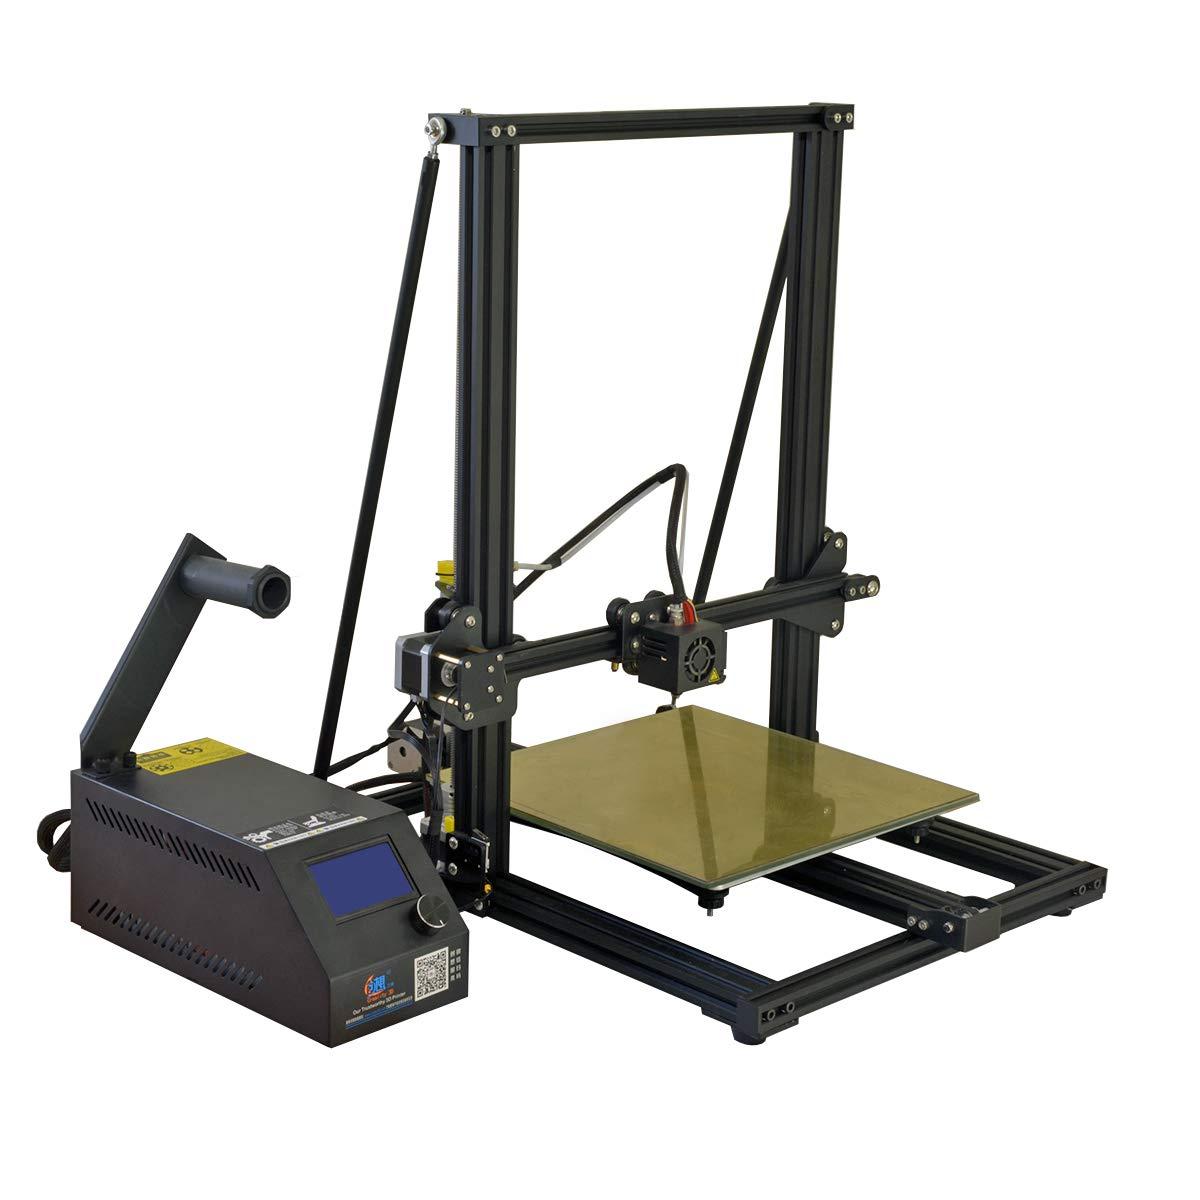 [Gulfcoast Robotics] Rear Mounted Z-Brace Frame Support Rods Upgrade Kit for Creality CR-10, CR-10S and Tevo Tornado 3D Printers ZBRACE_CR10